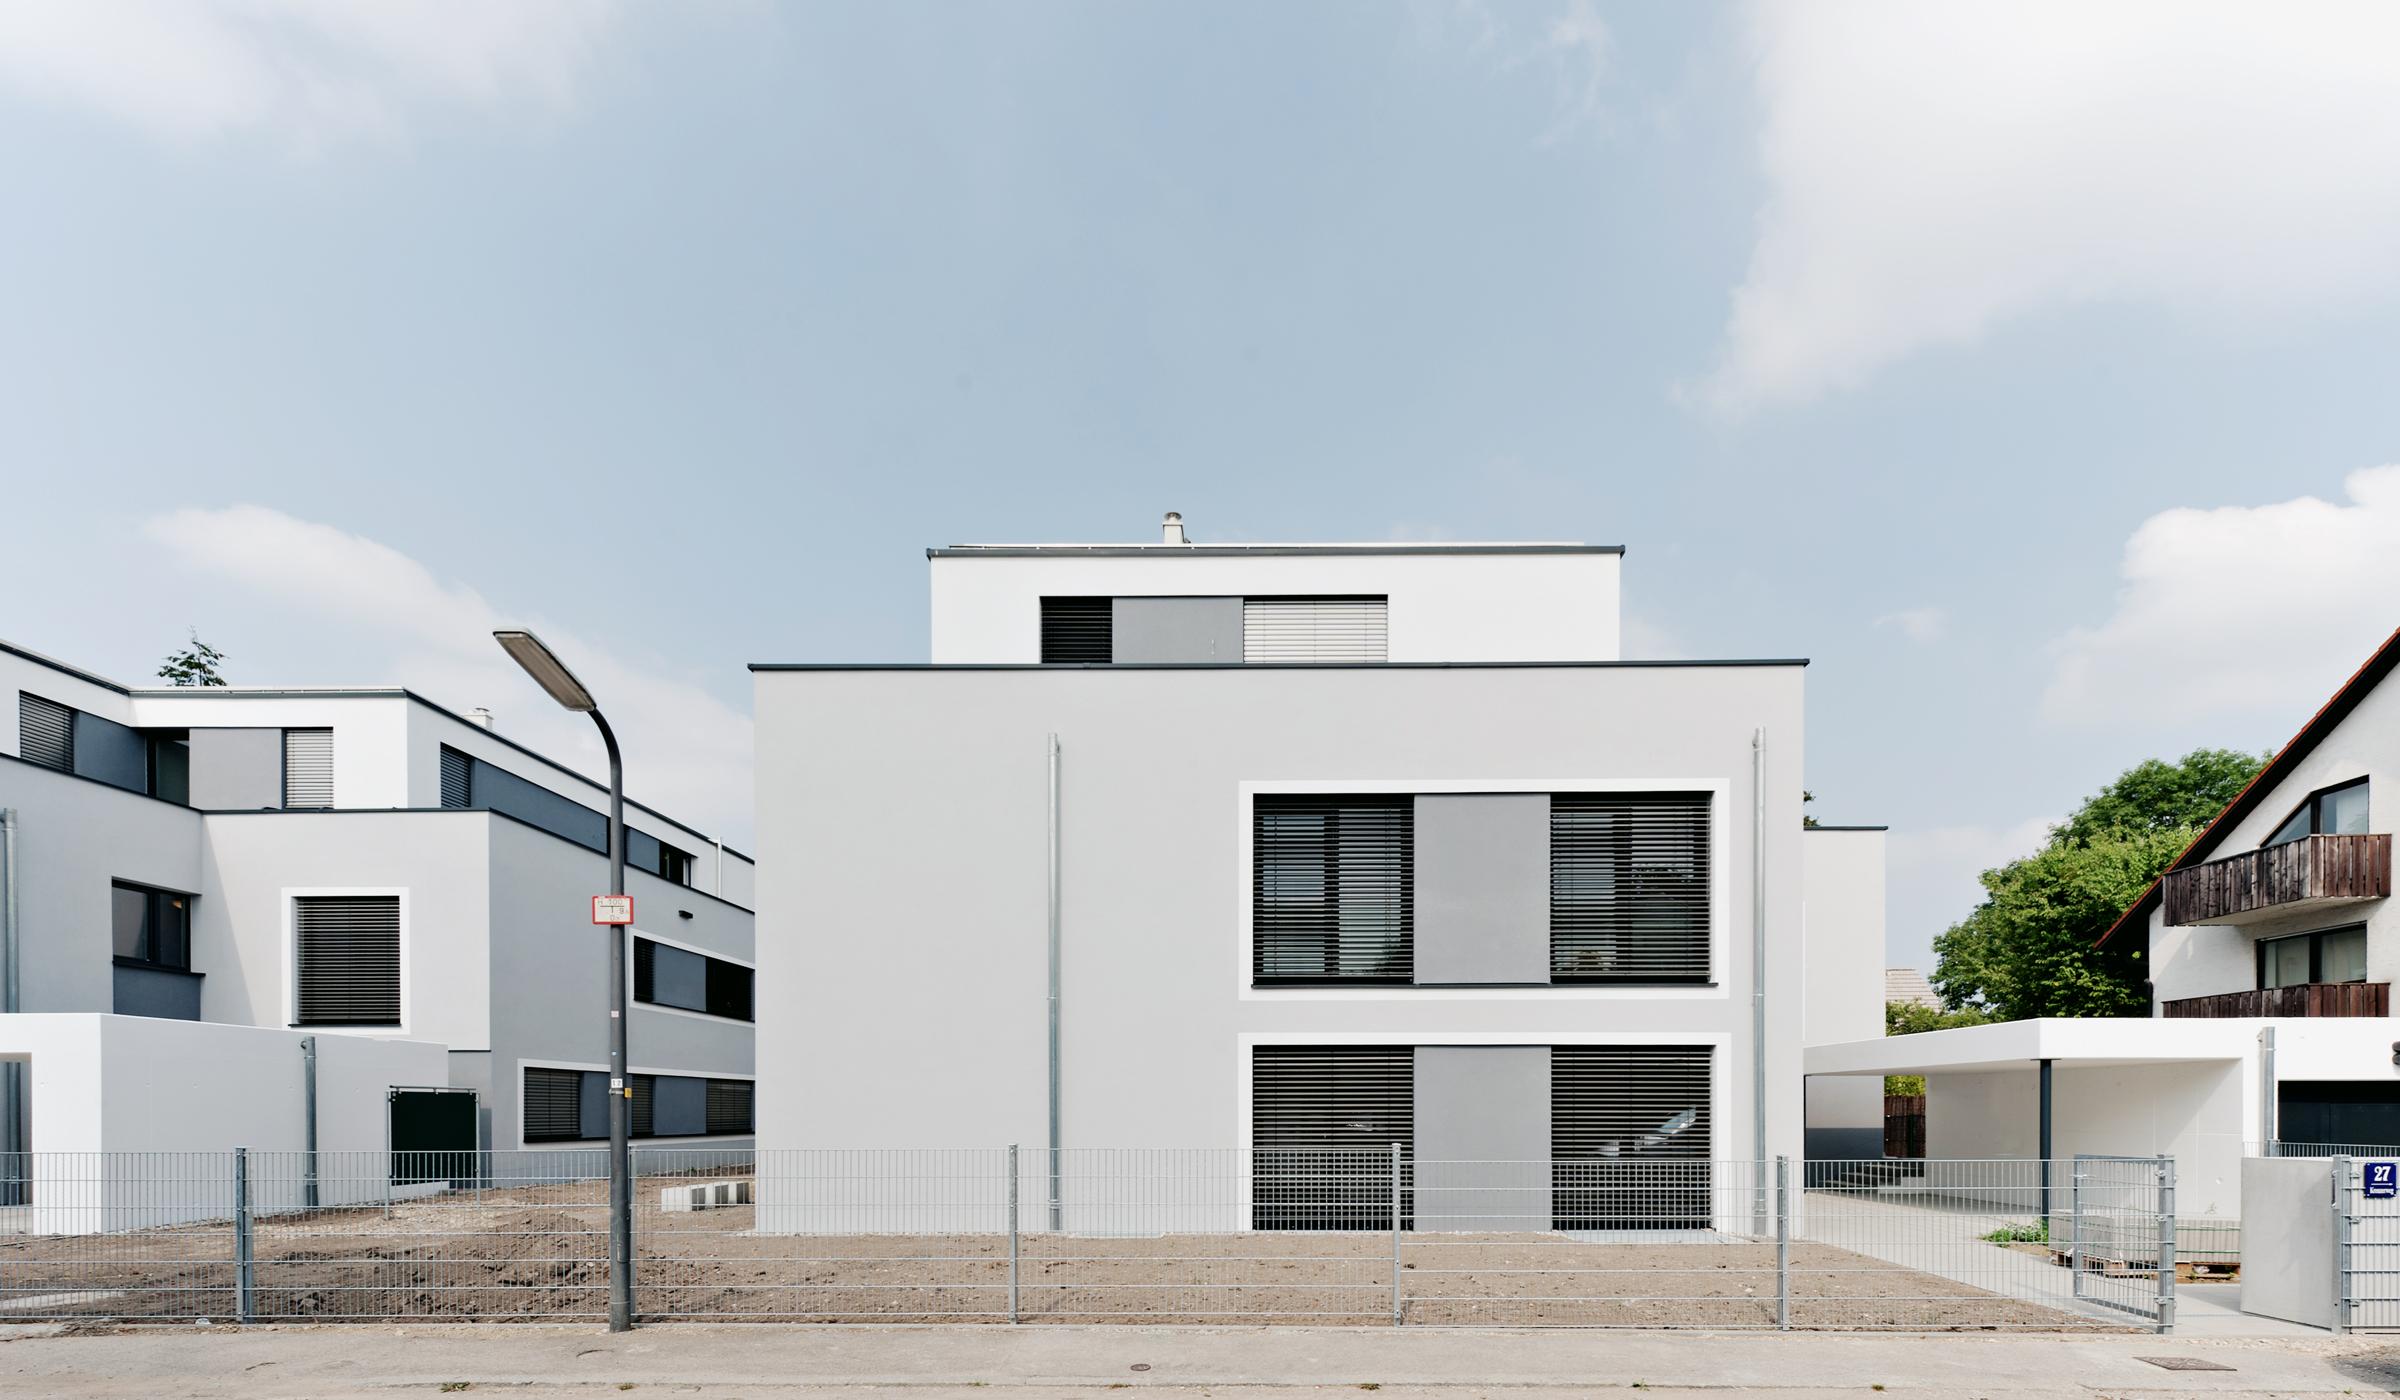 3bau_kreuzerweg_referenz